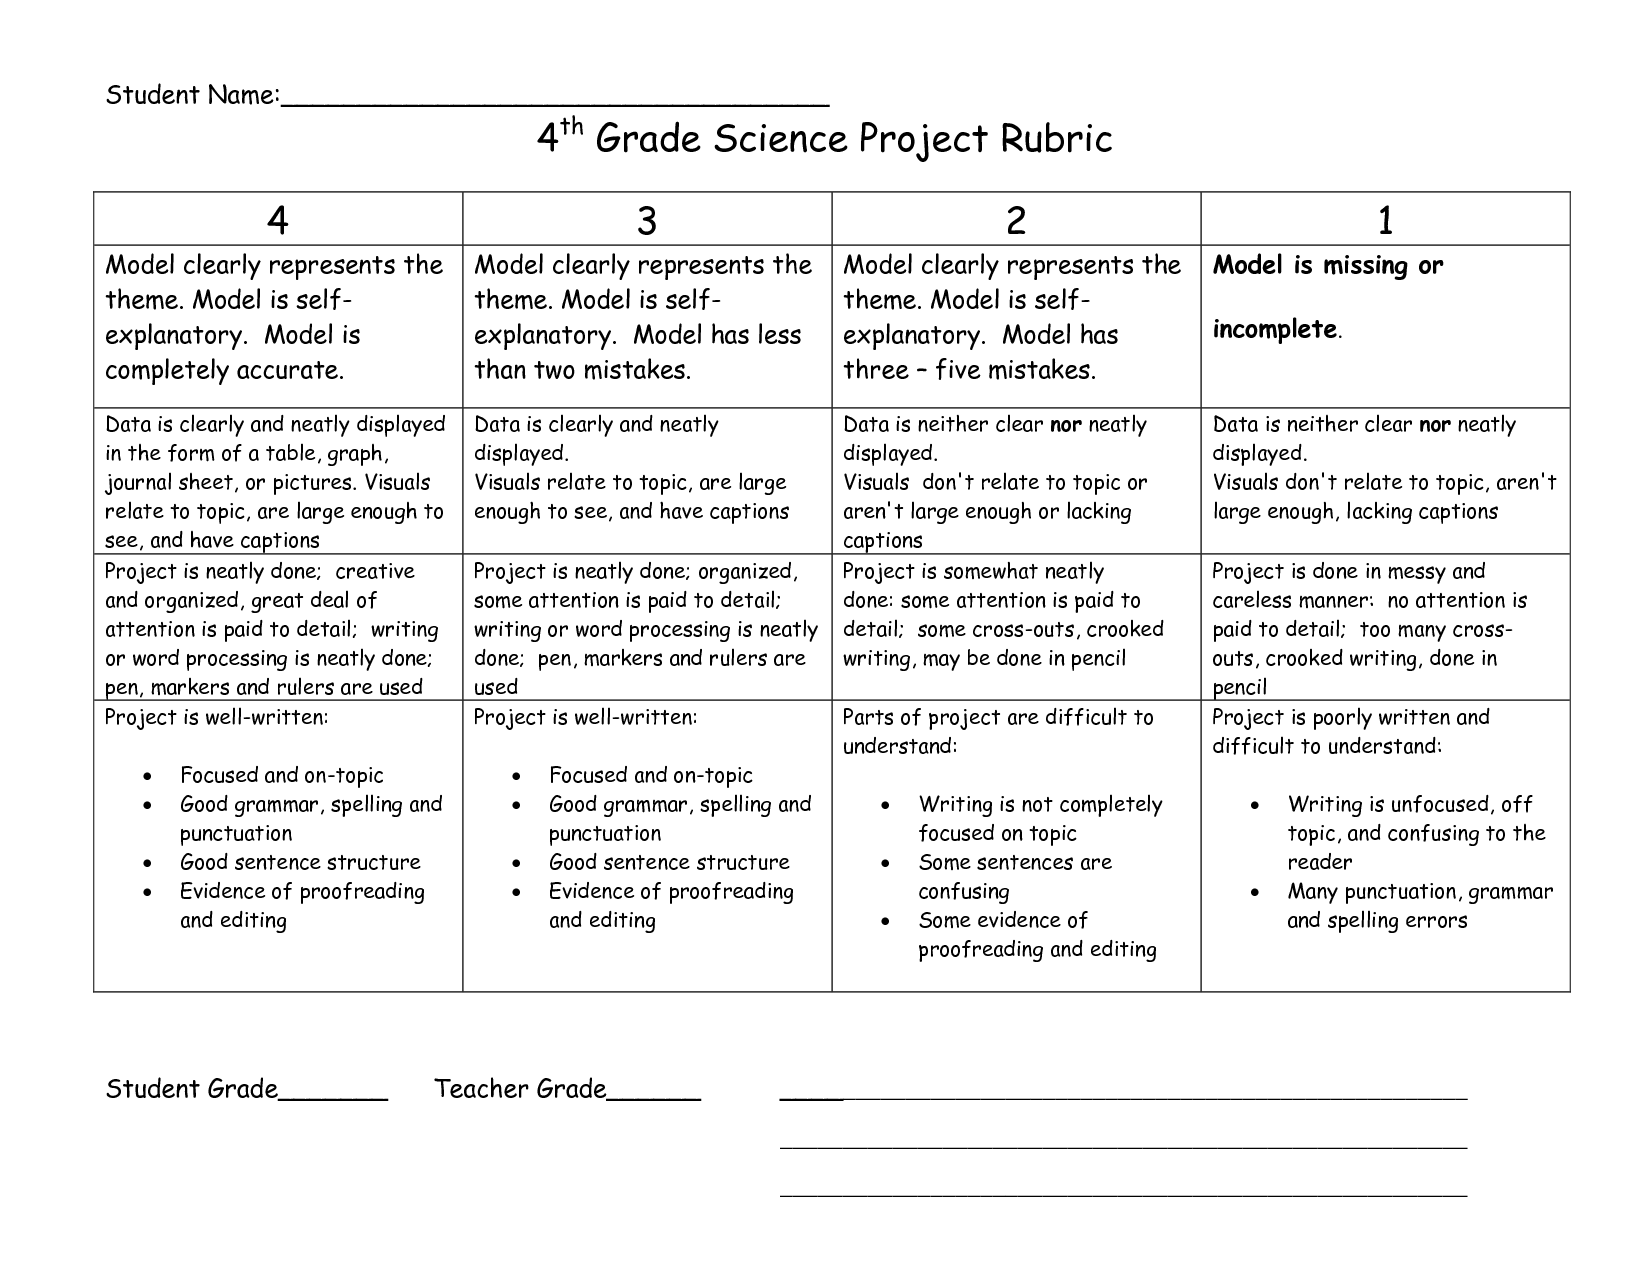 4th Grade Science Project Rubric